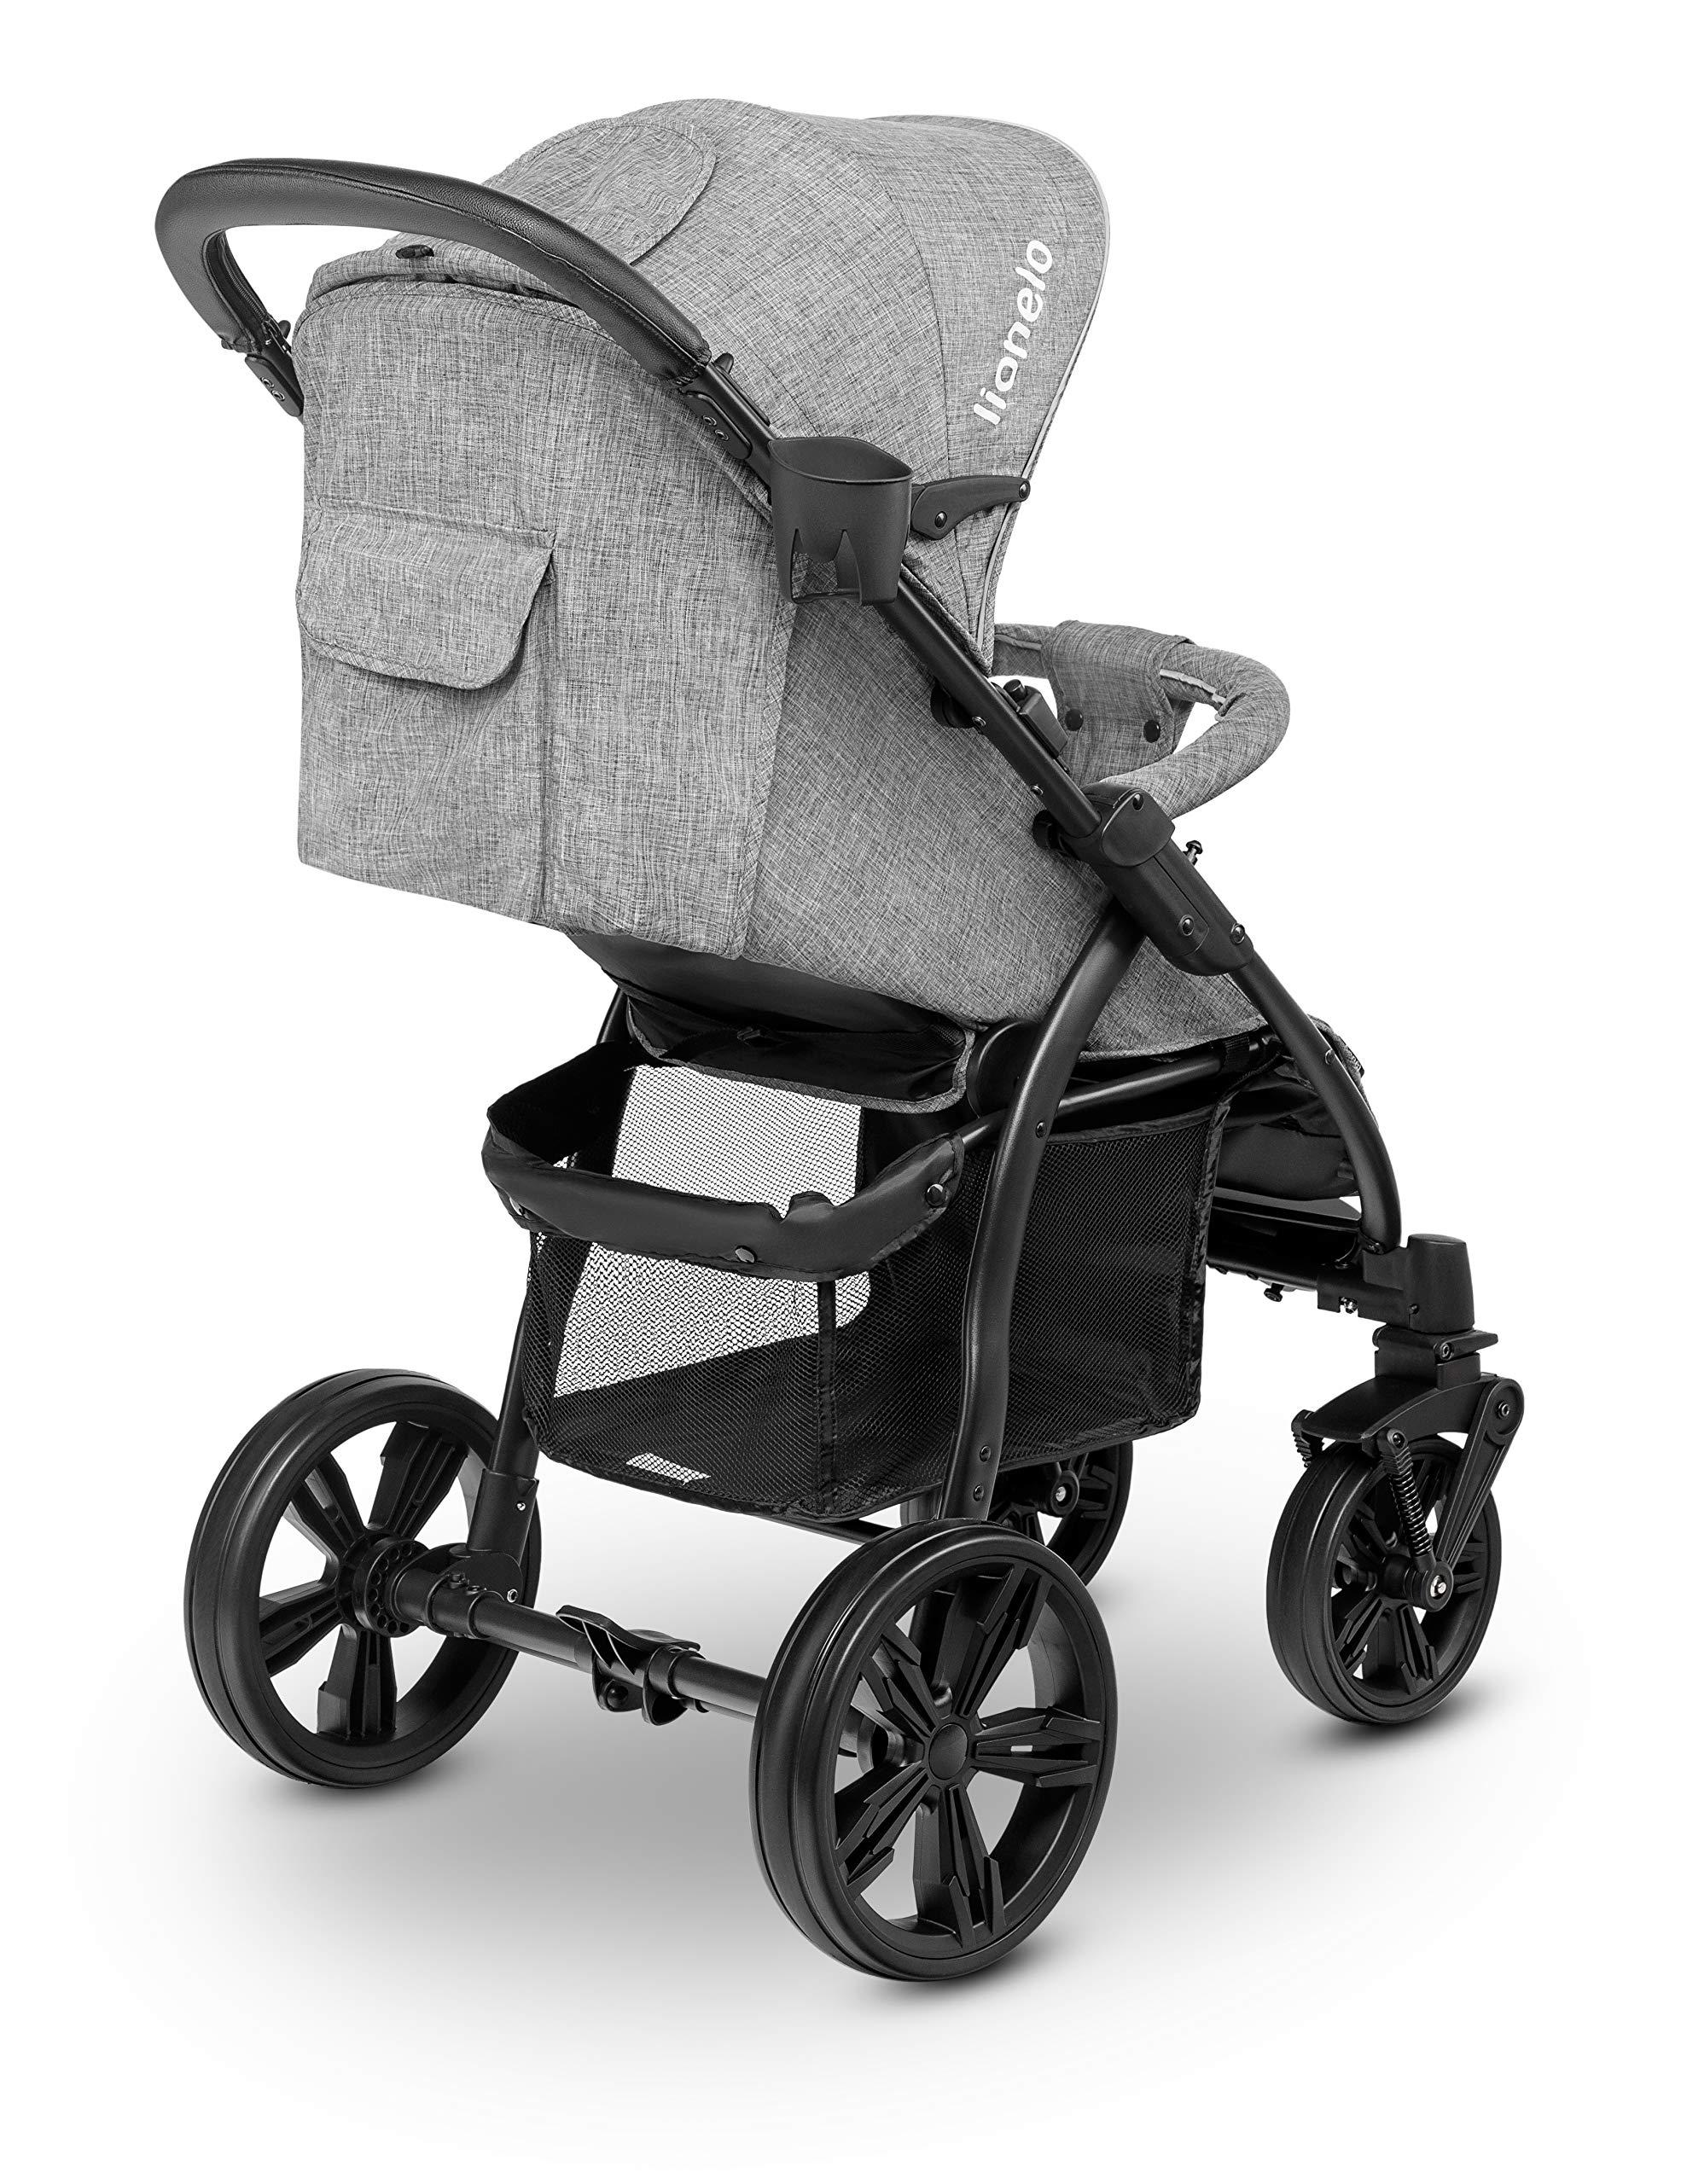 Lionelo 5902581656278 LO-Annet Concrete Stroller Pushchair (Light-Gray)   4